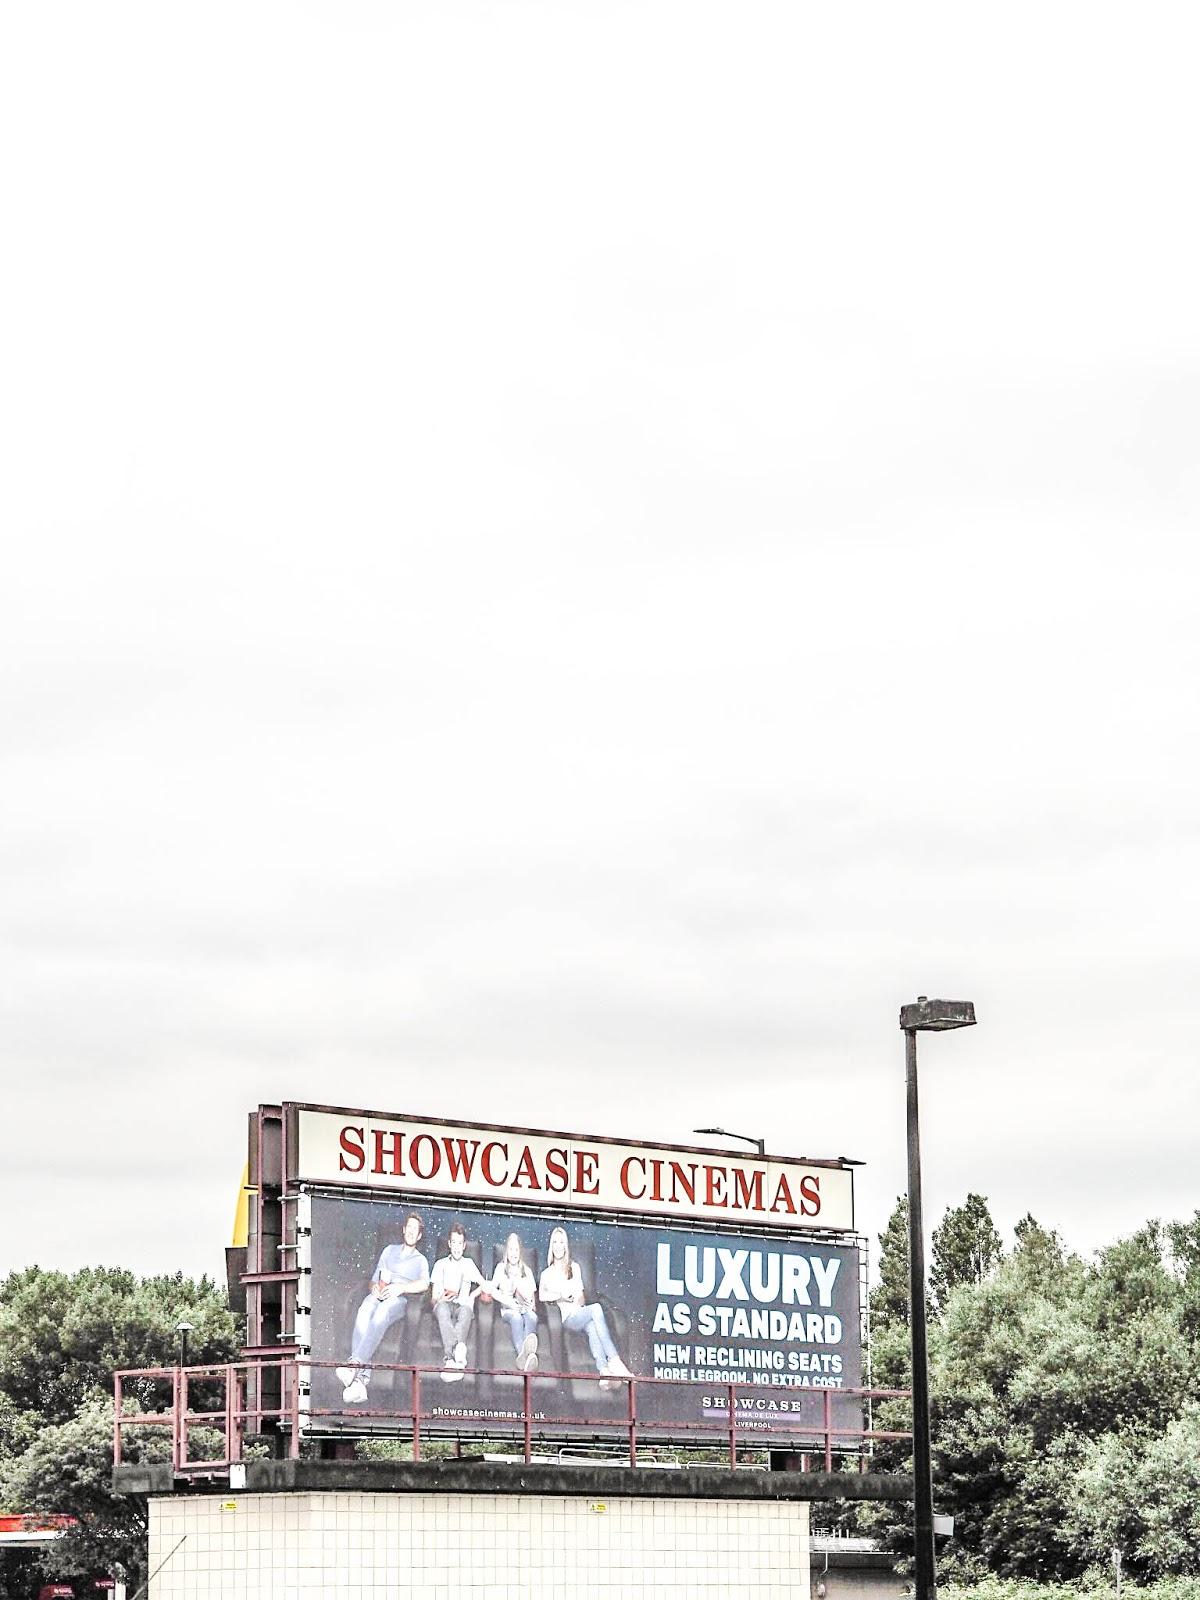 Showcase Cinema Liverpool